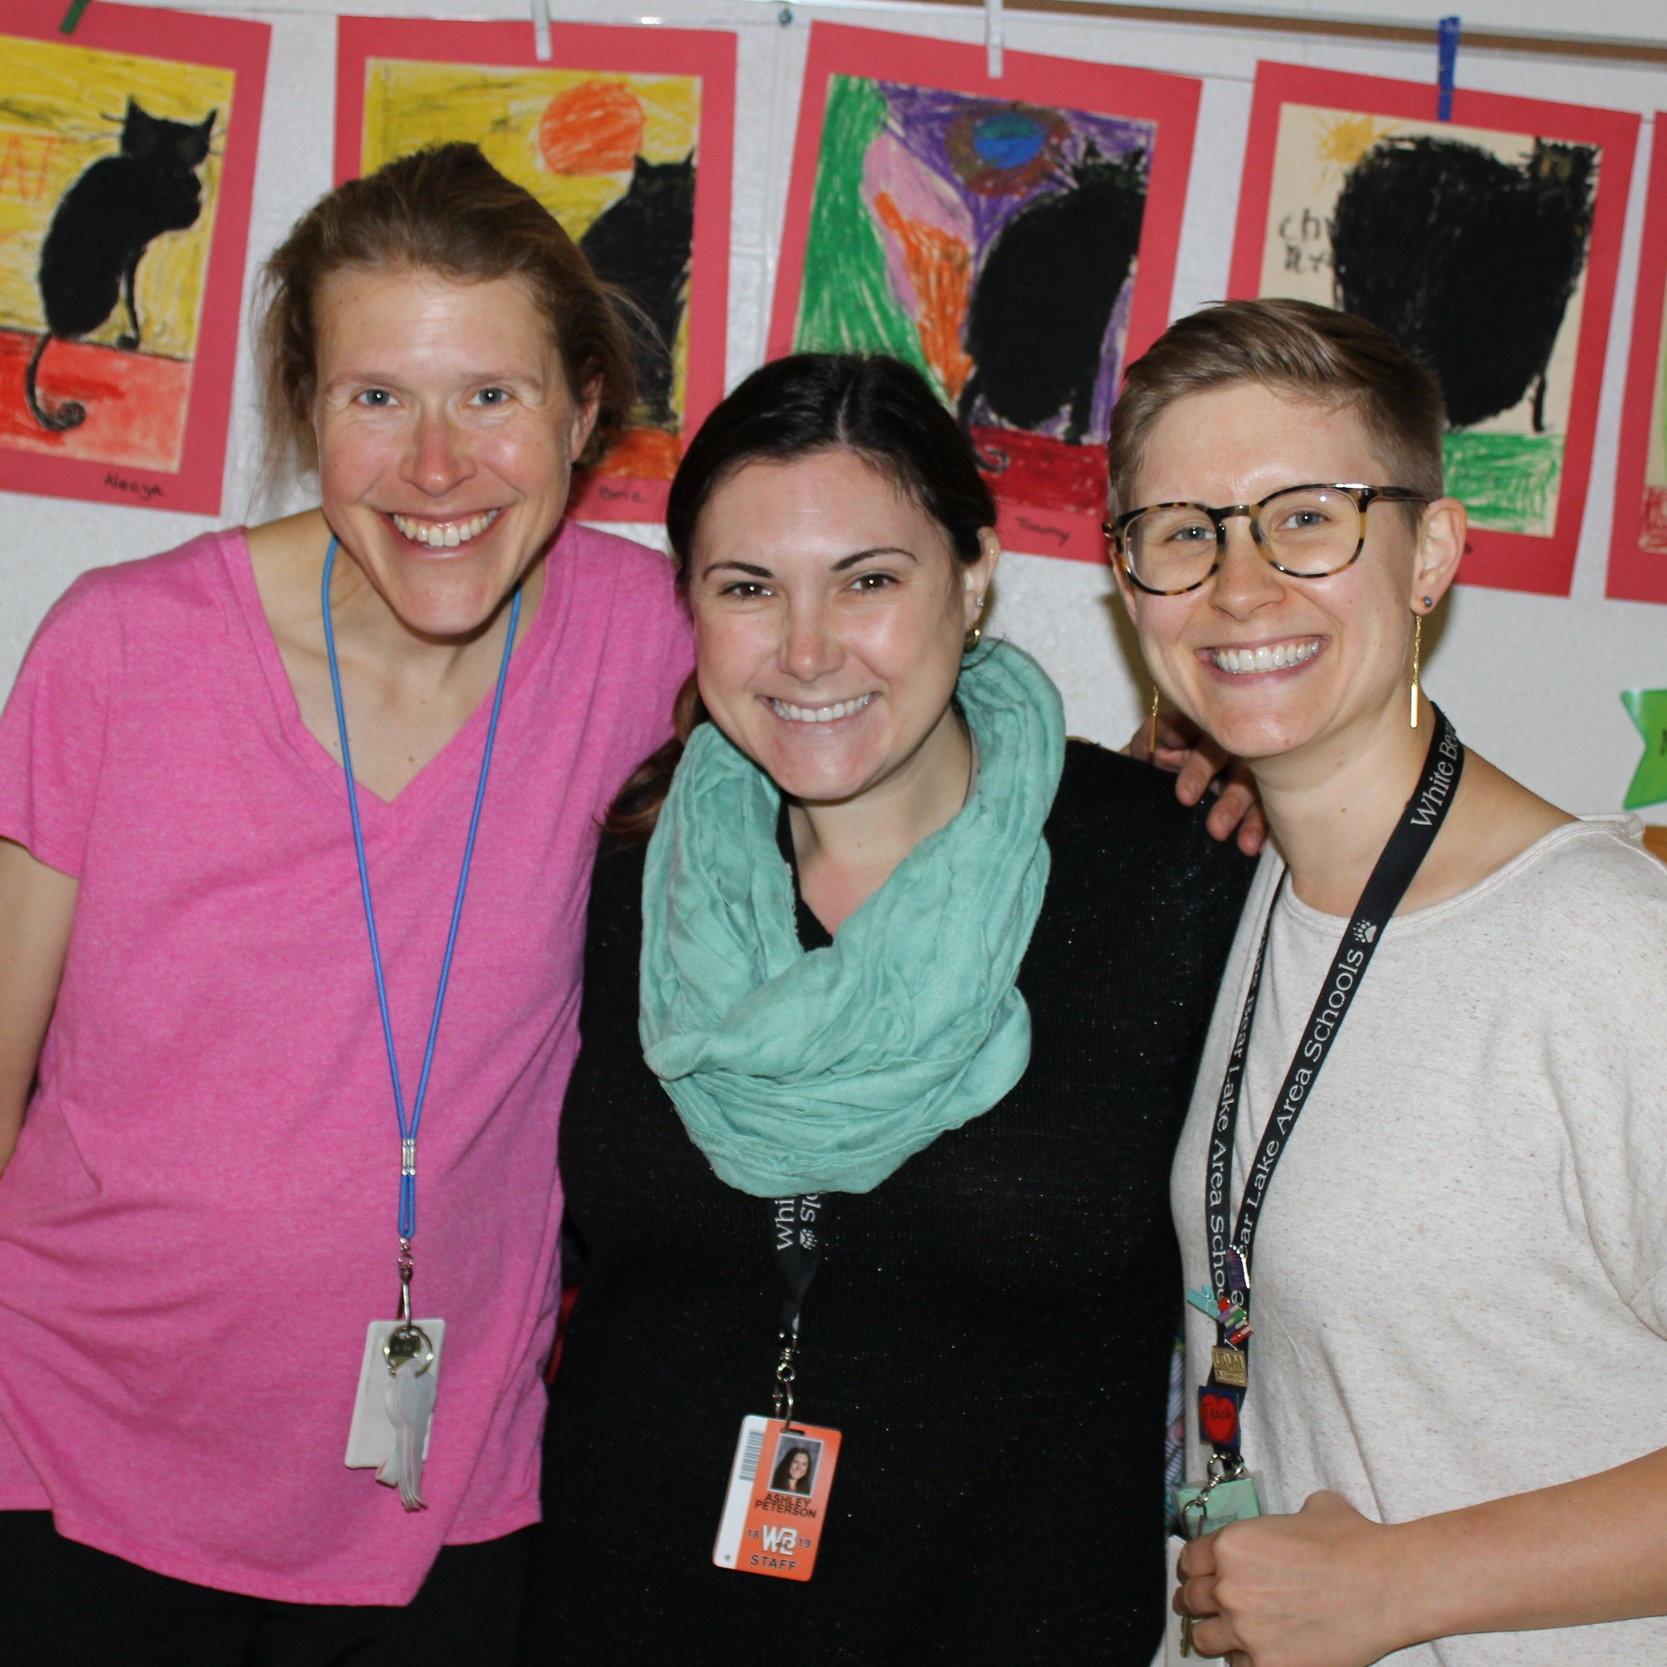 Erin Maas, Ashley Peterson, Chelsea Fieder - Matoska